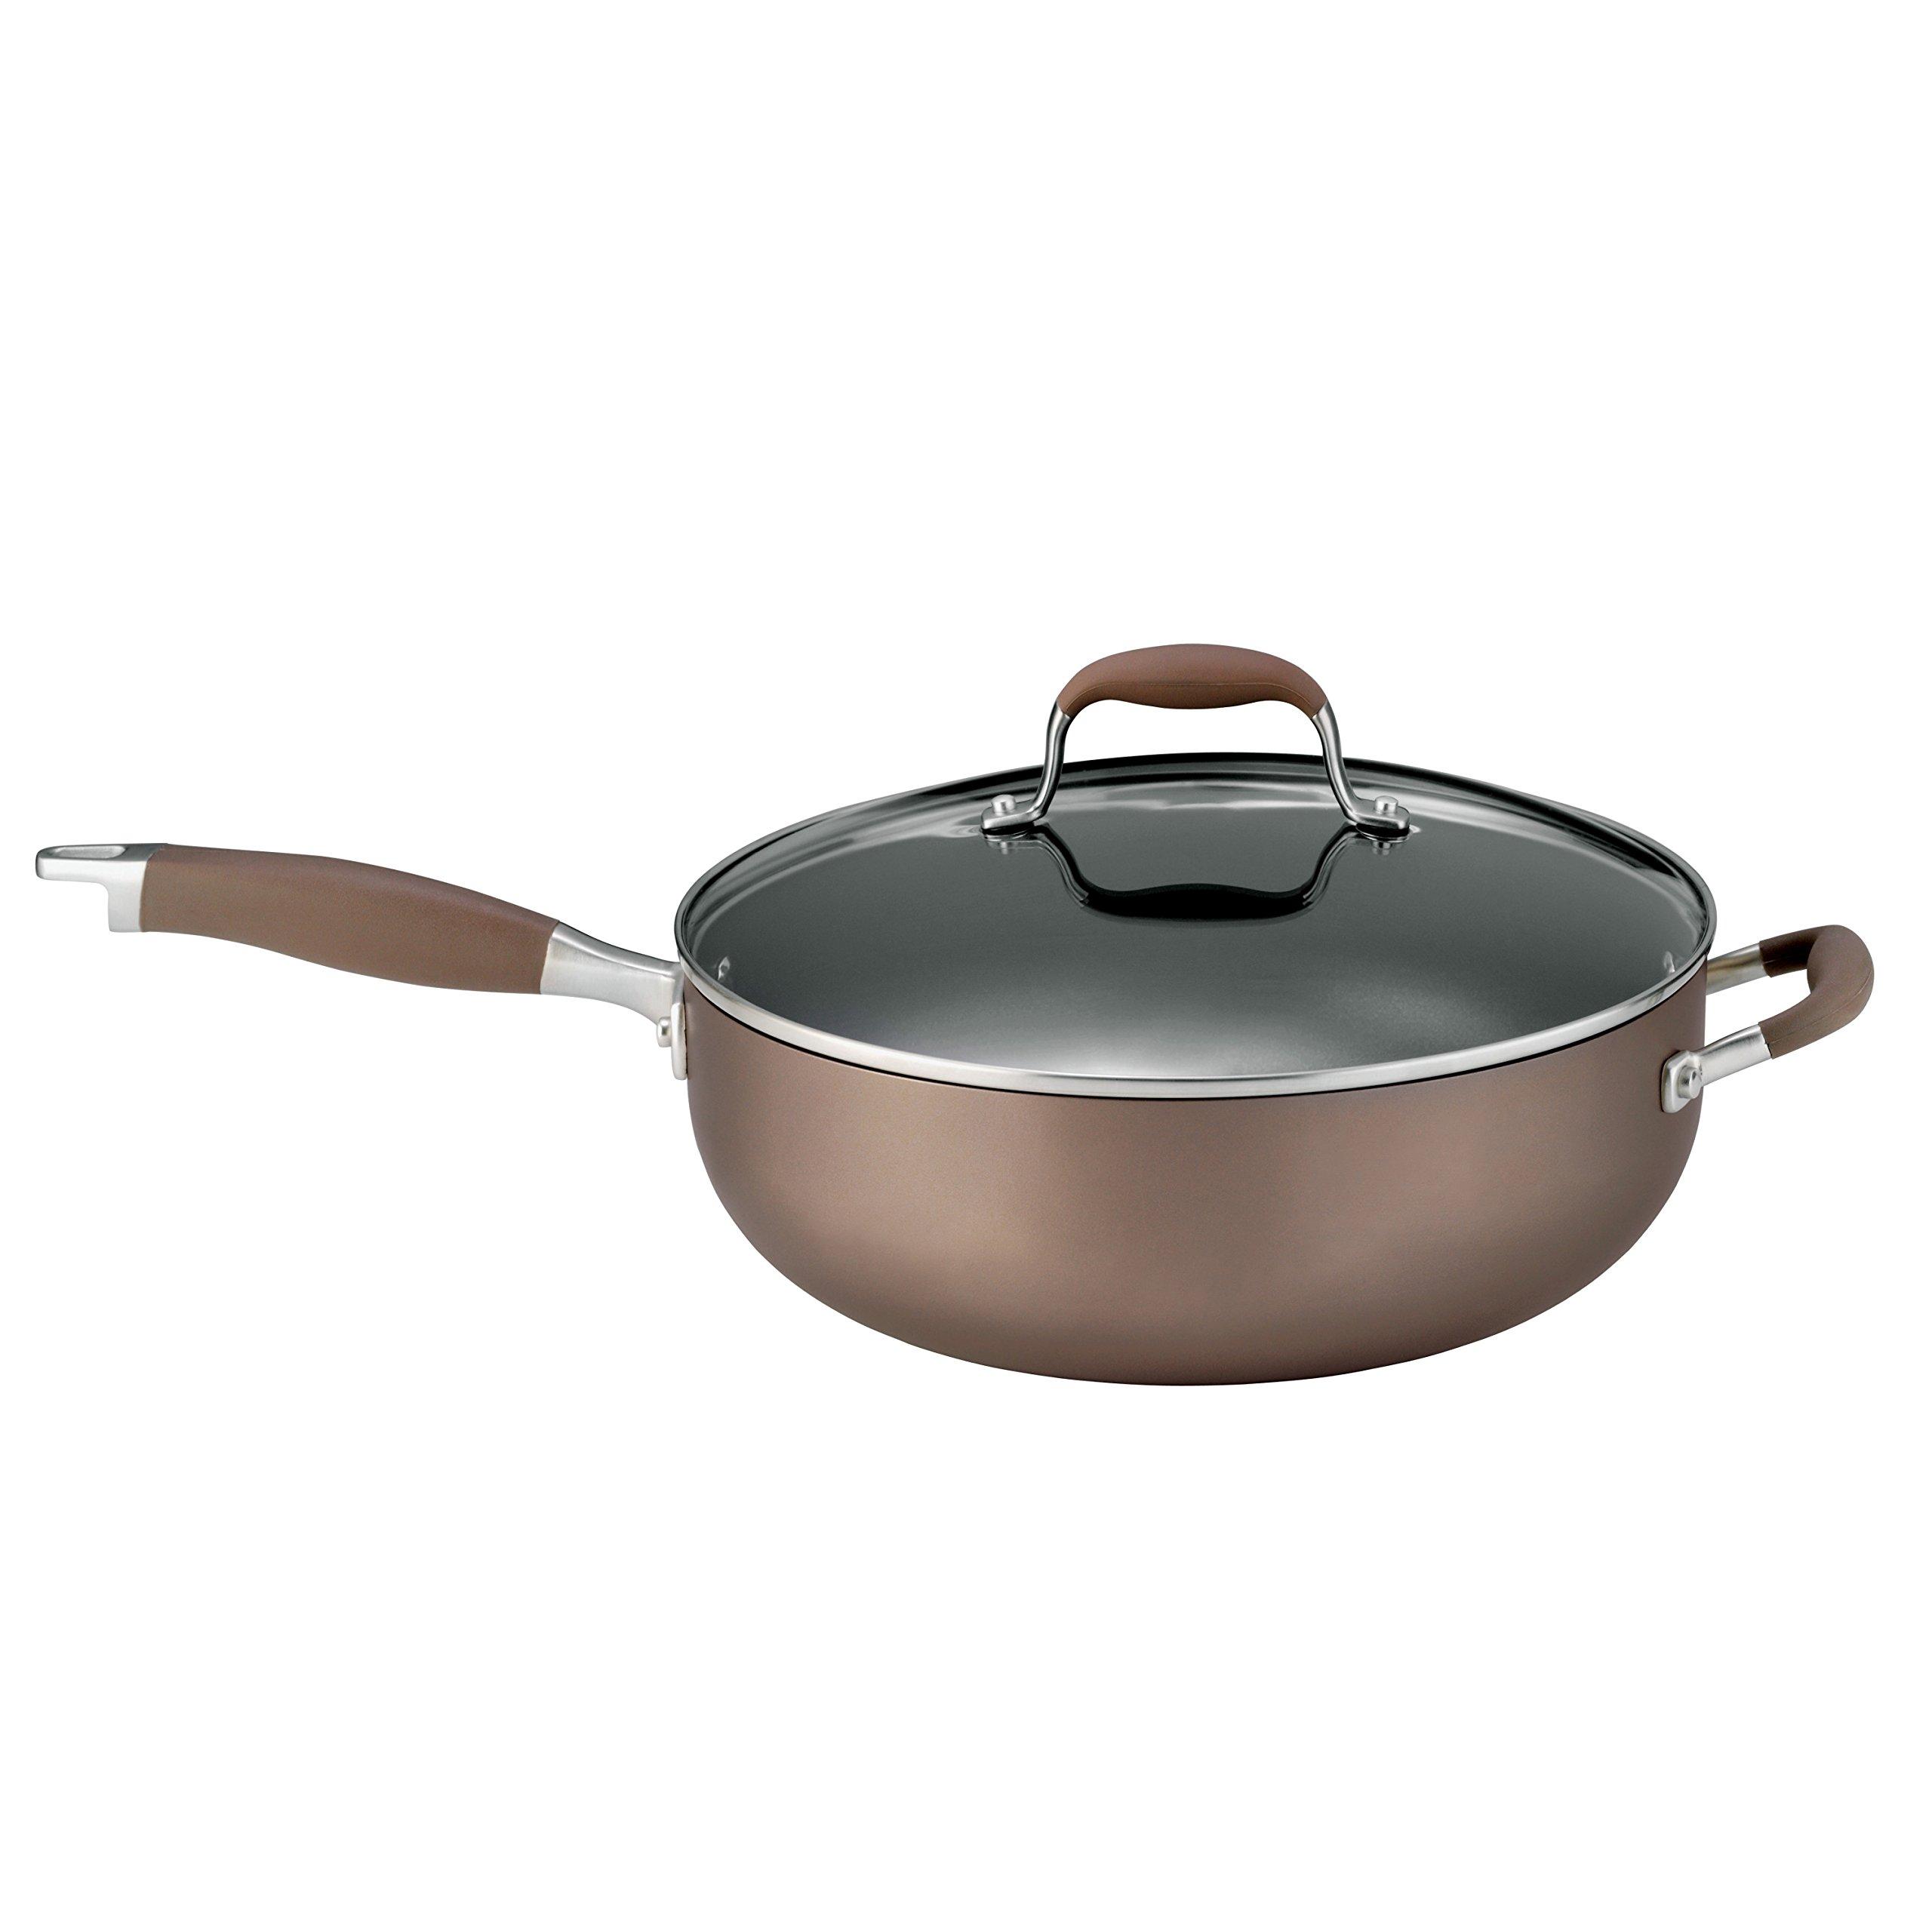 Anolon 83344M Advanced Bronze Hard Anodized Nonstick 5 Quart Covered Chef Pan